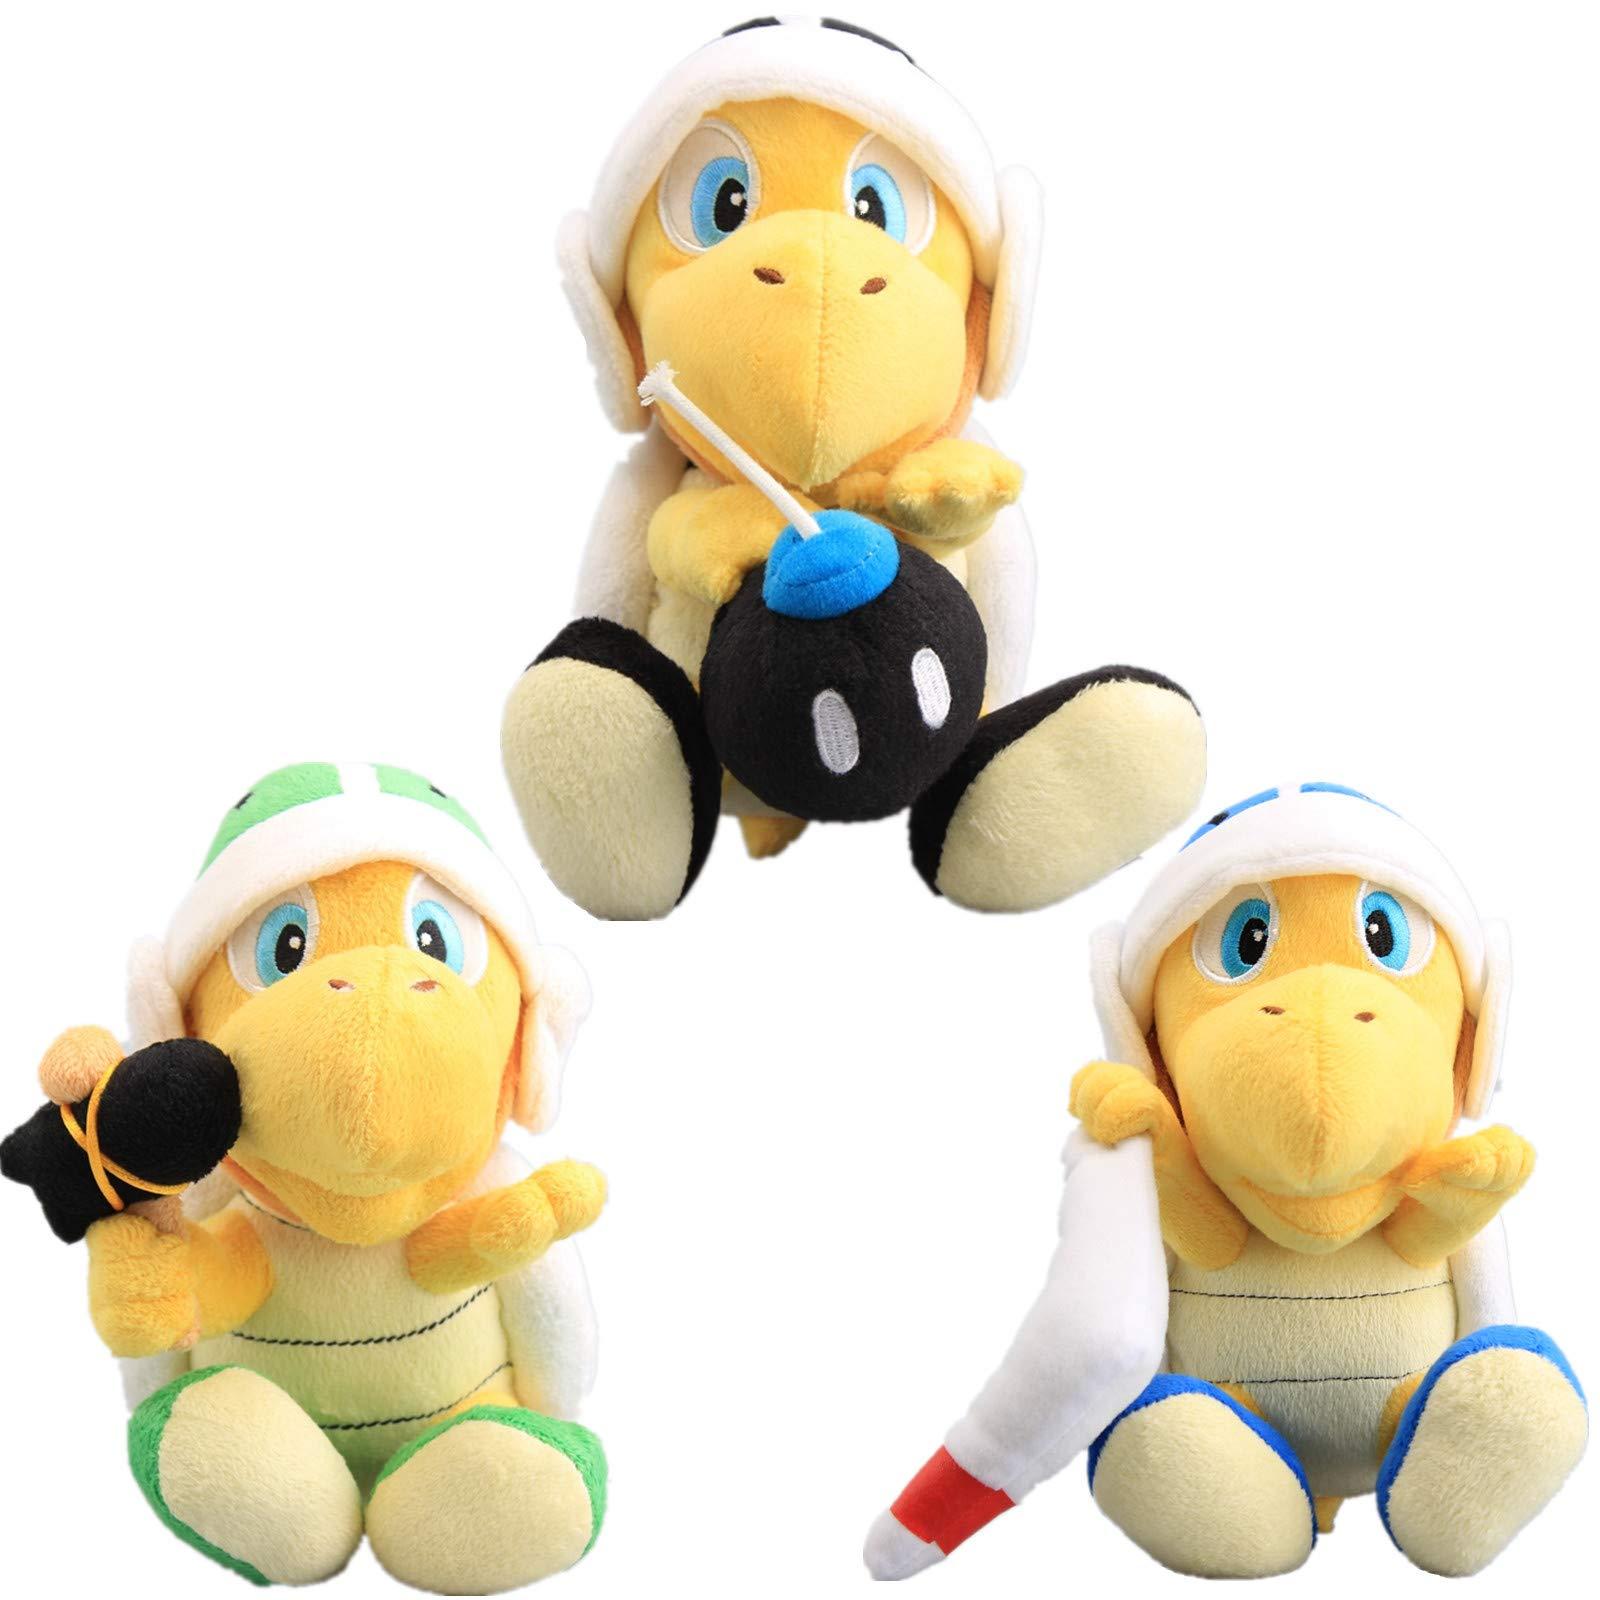 uiuoutoy Super Mario Bros. Hammer Bro & Boomerang Bro & Bomb Bro Koopa Plush 8'' Set of 3pcs by uiuoutoy